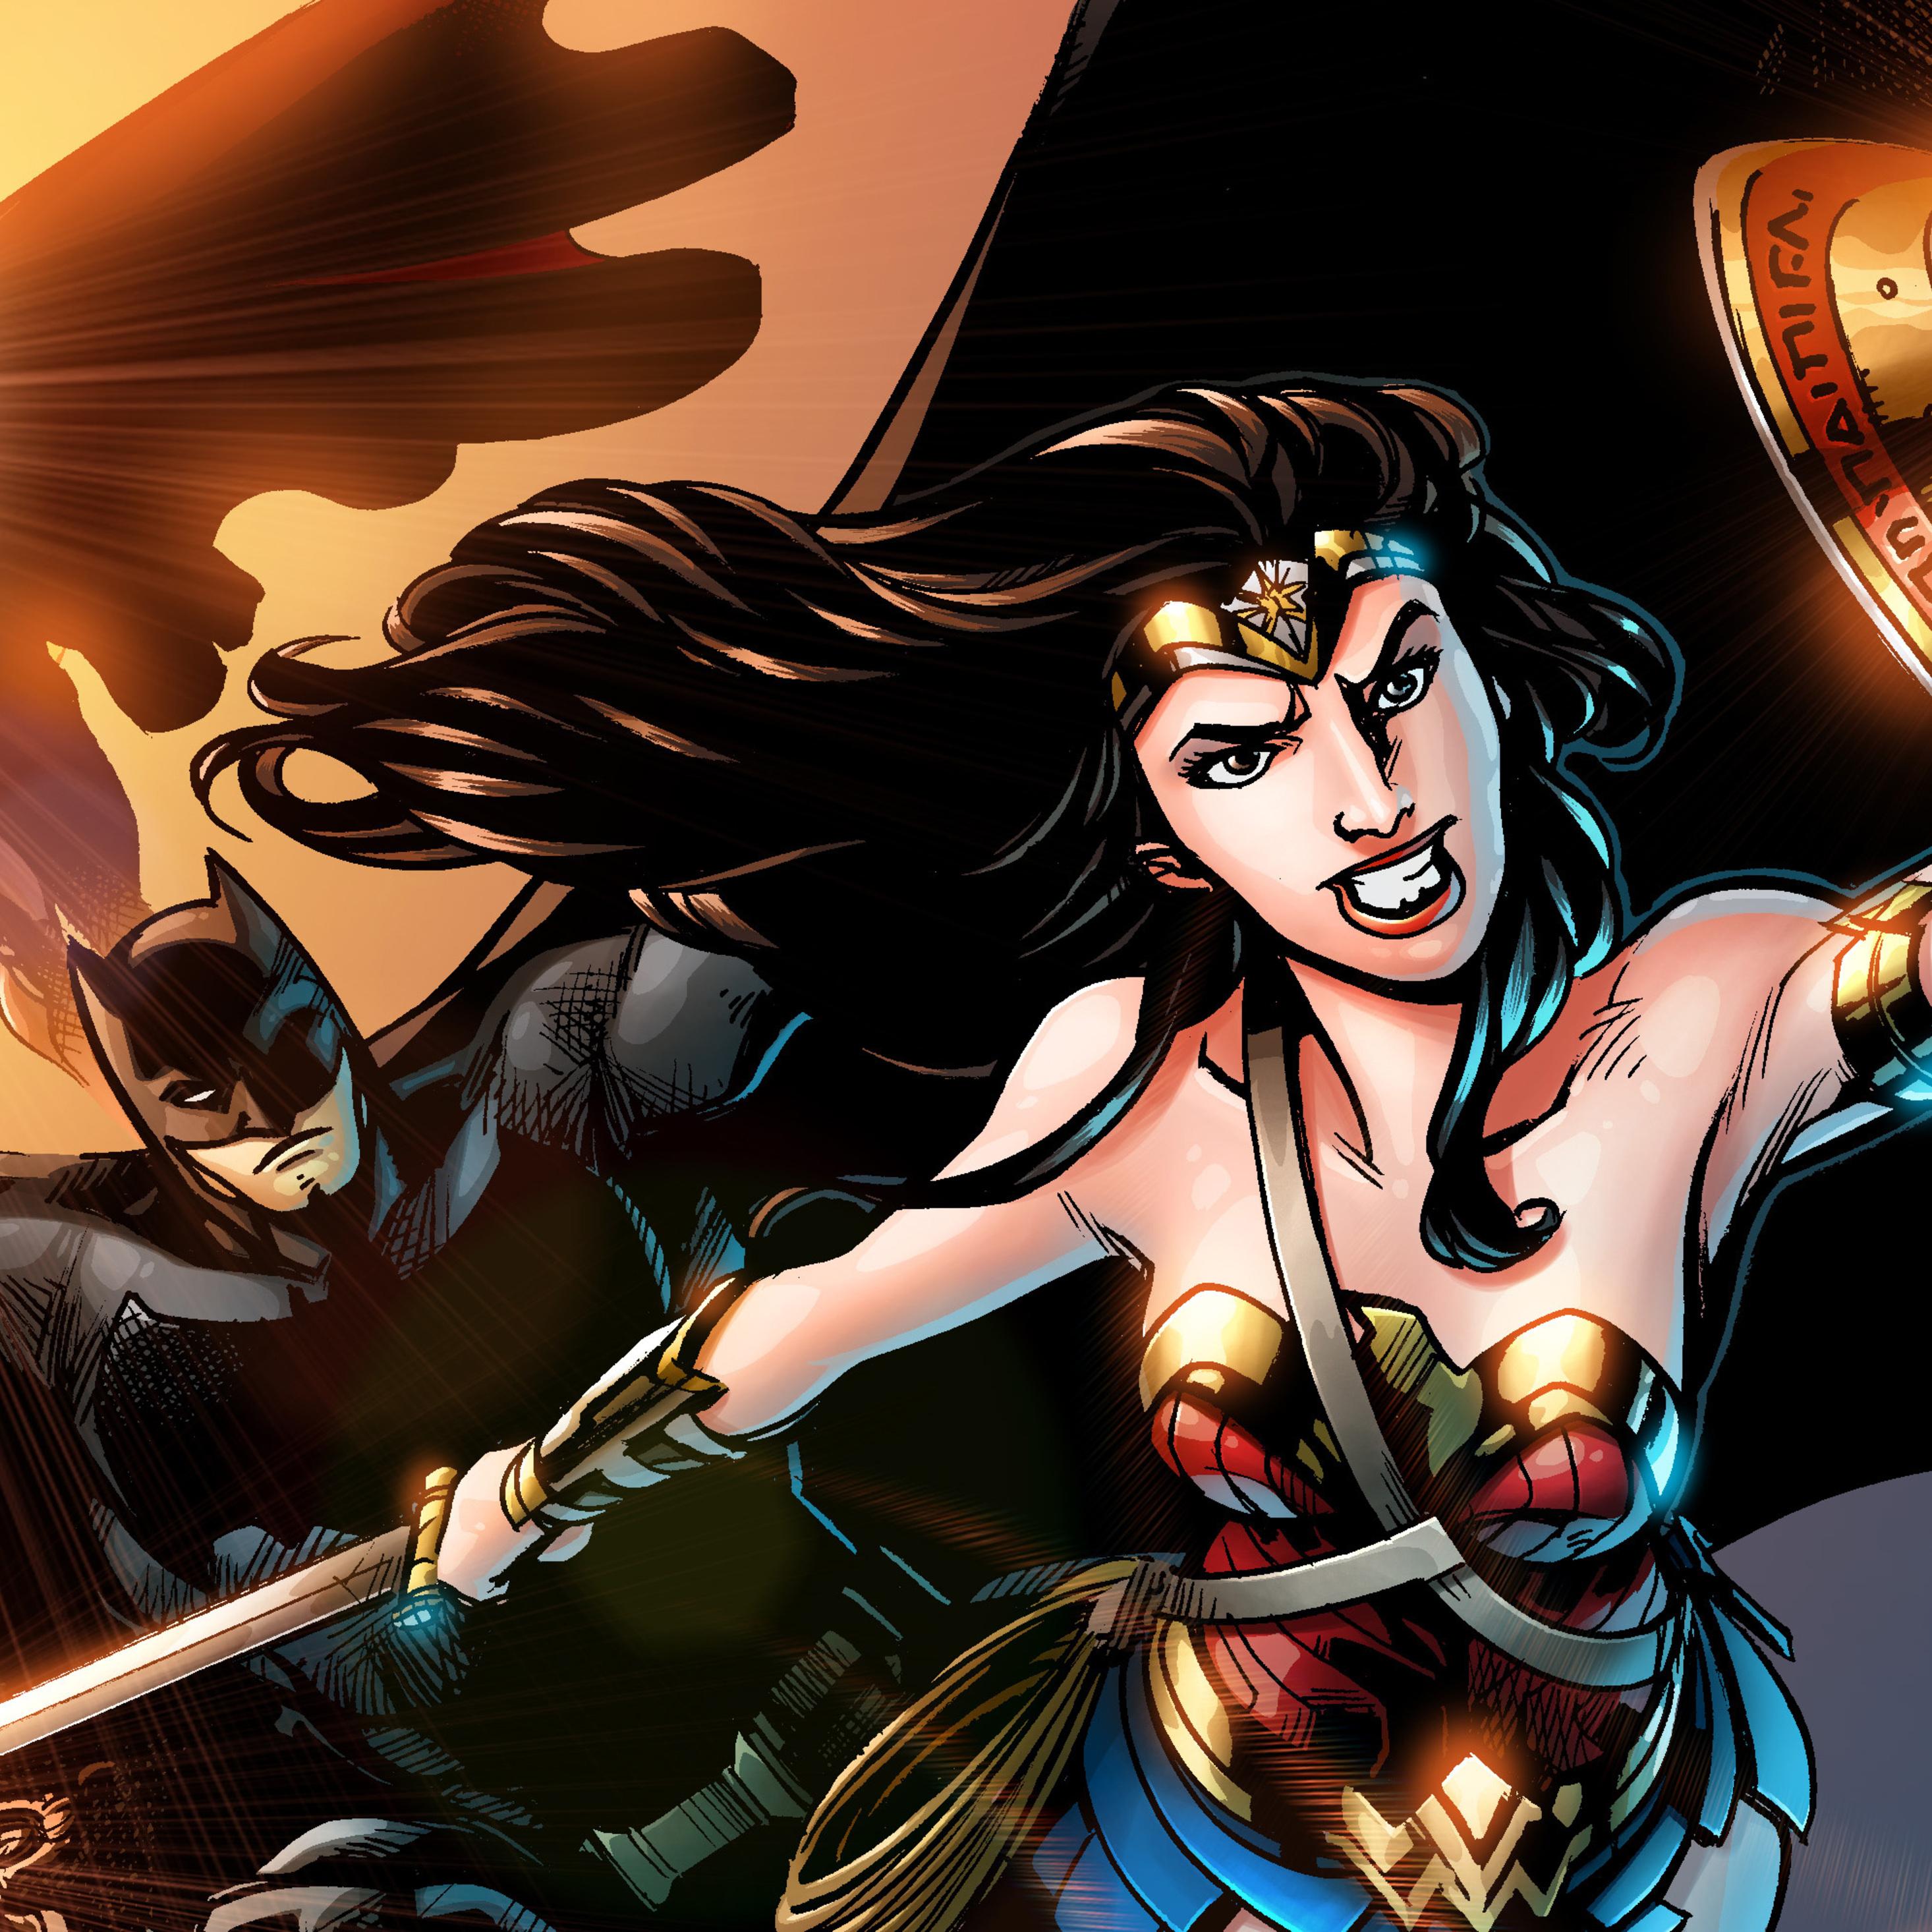 justice-league-wonder-woman-superman-batman-9j.jpg